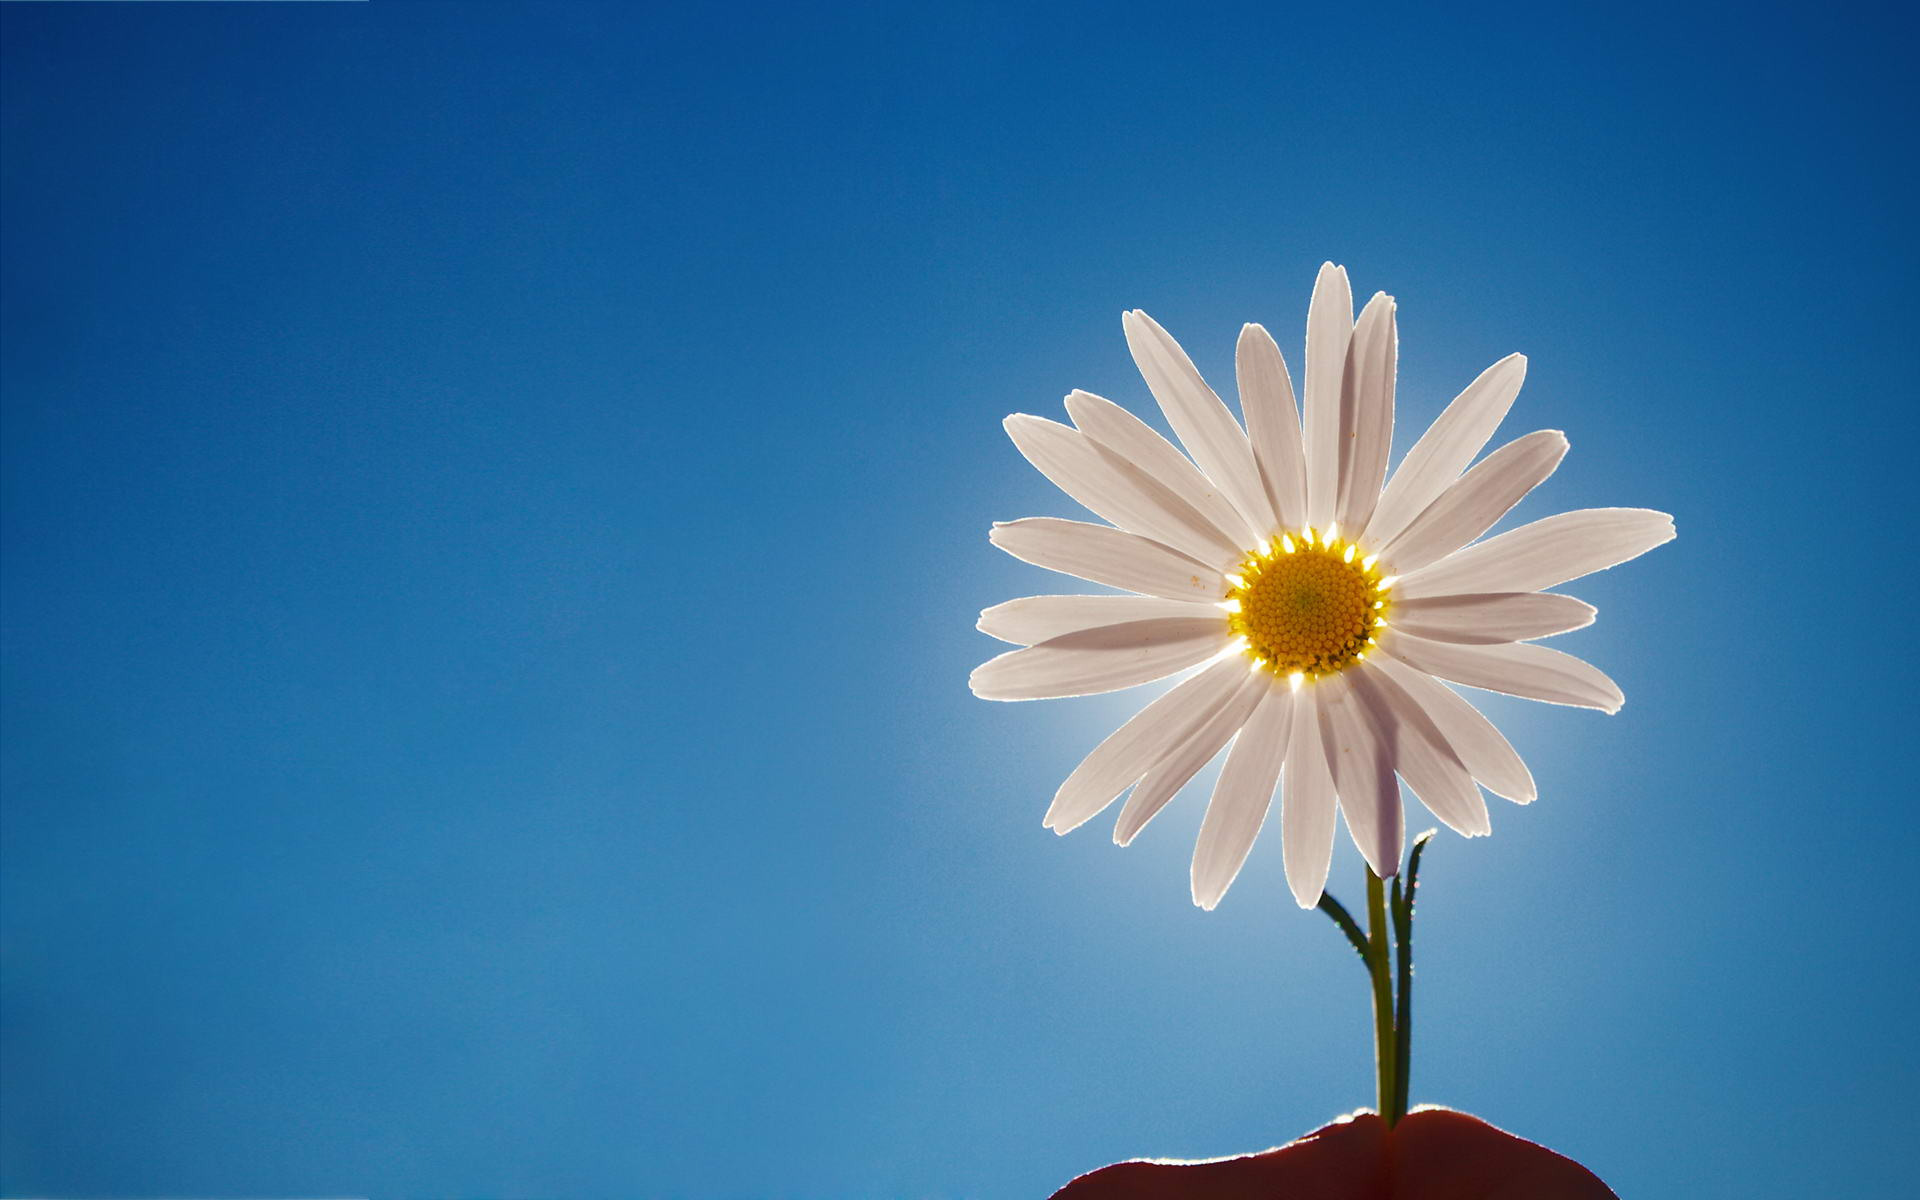 marguerite, daisy